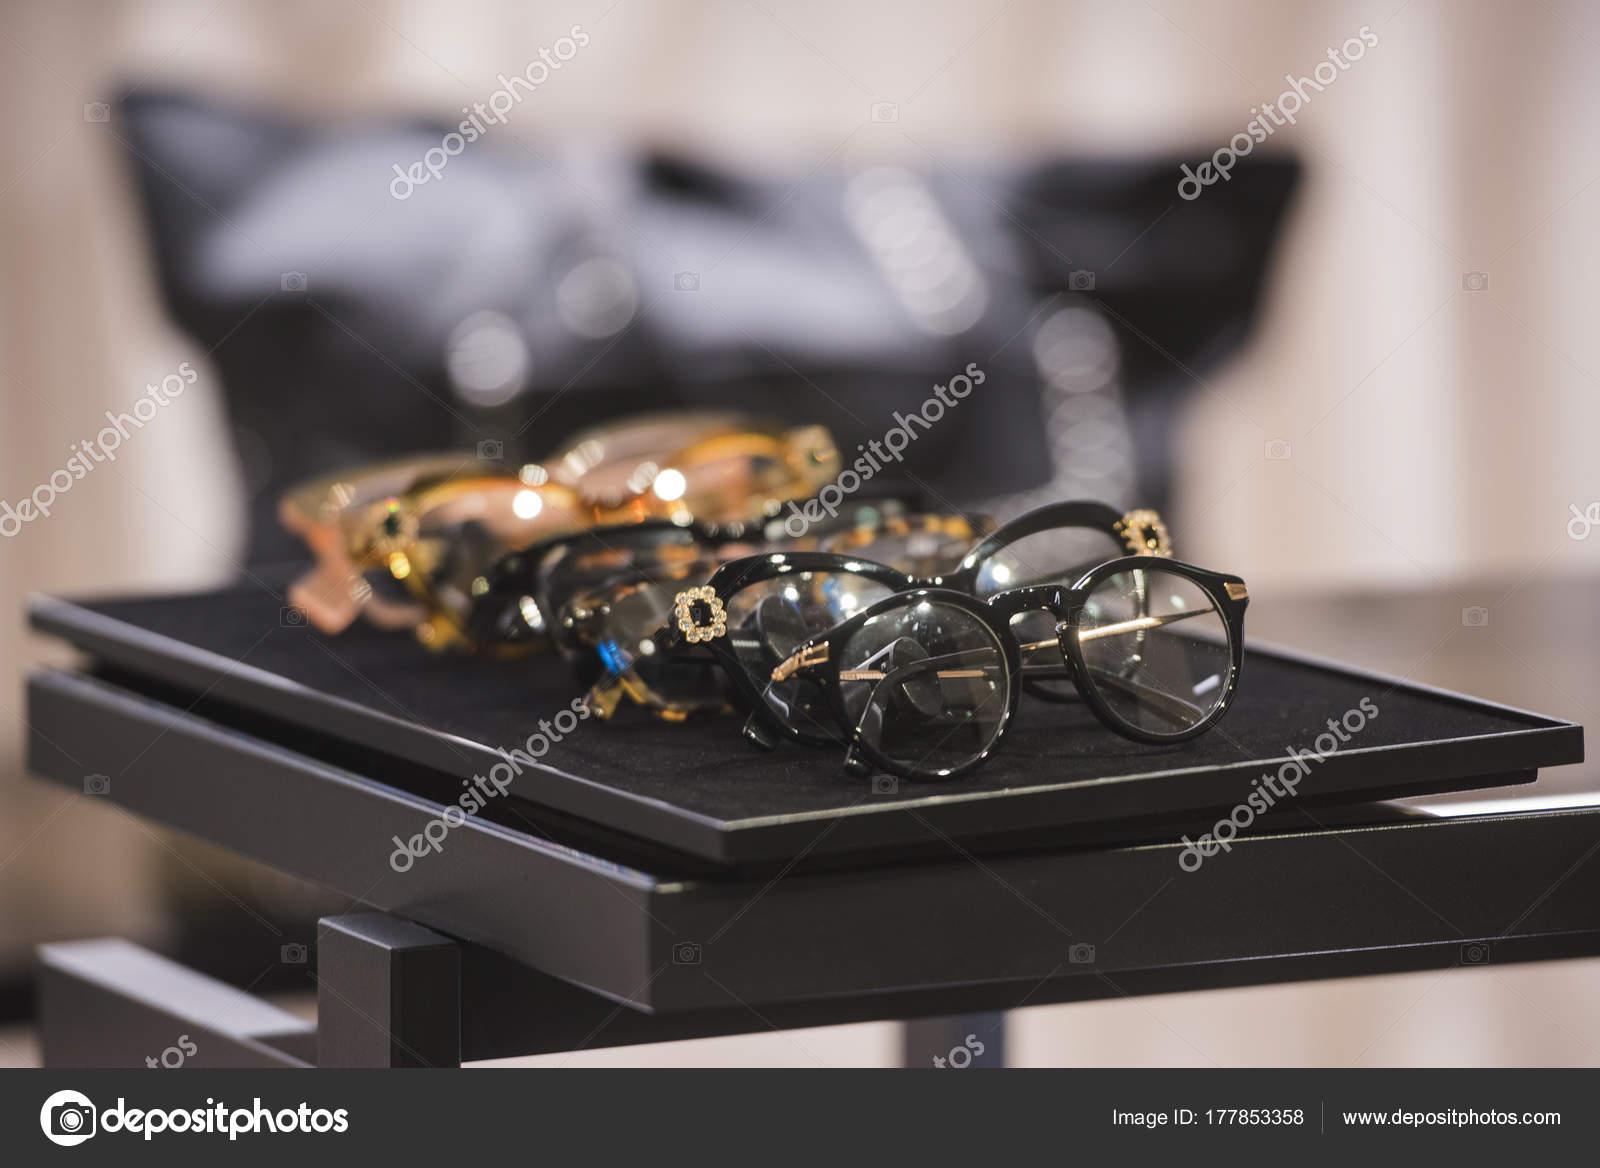 — Paris Lunettes Magasin Agcreativelab Photographie Dans Luxe ygb76f